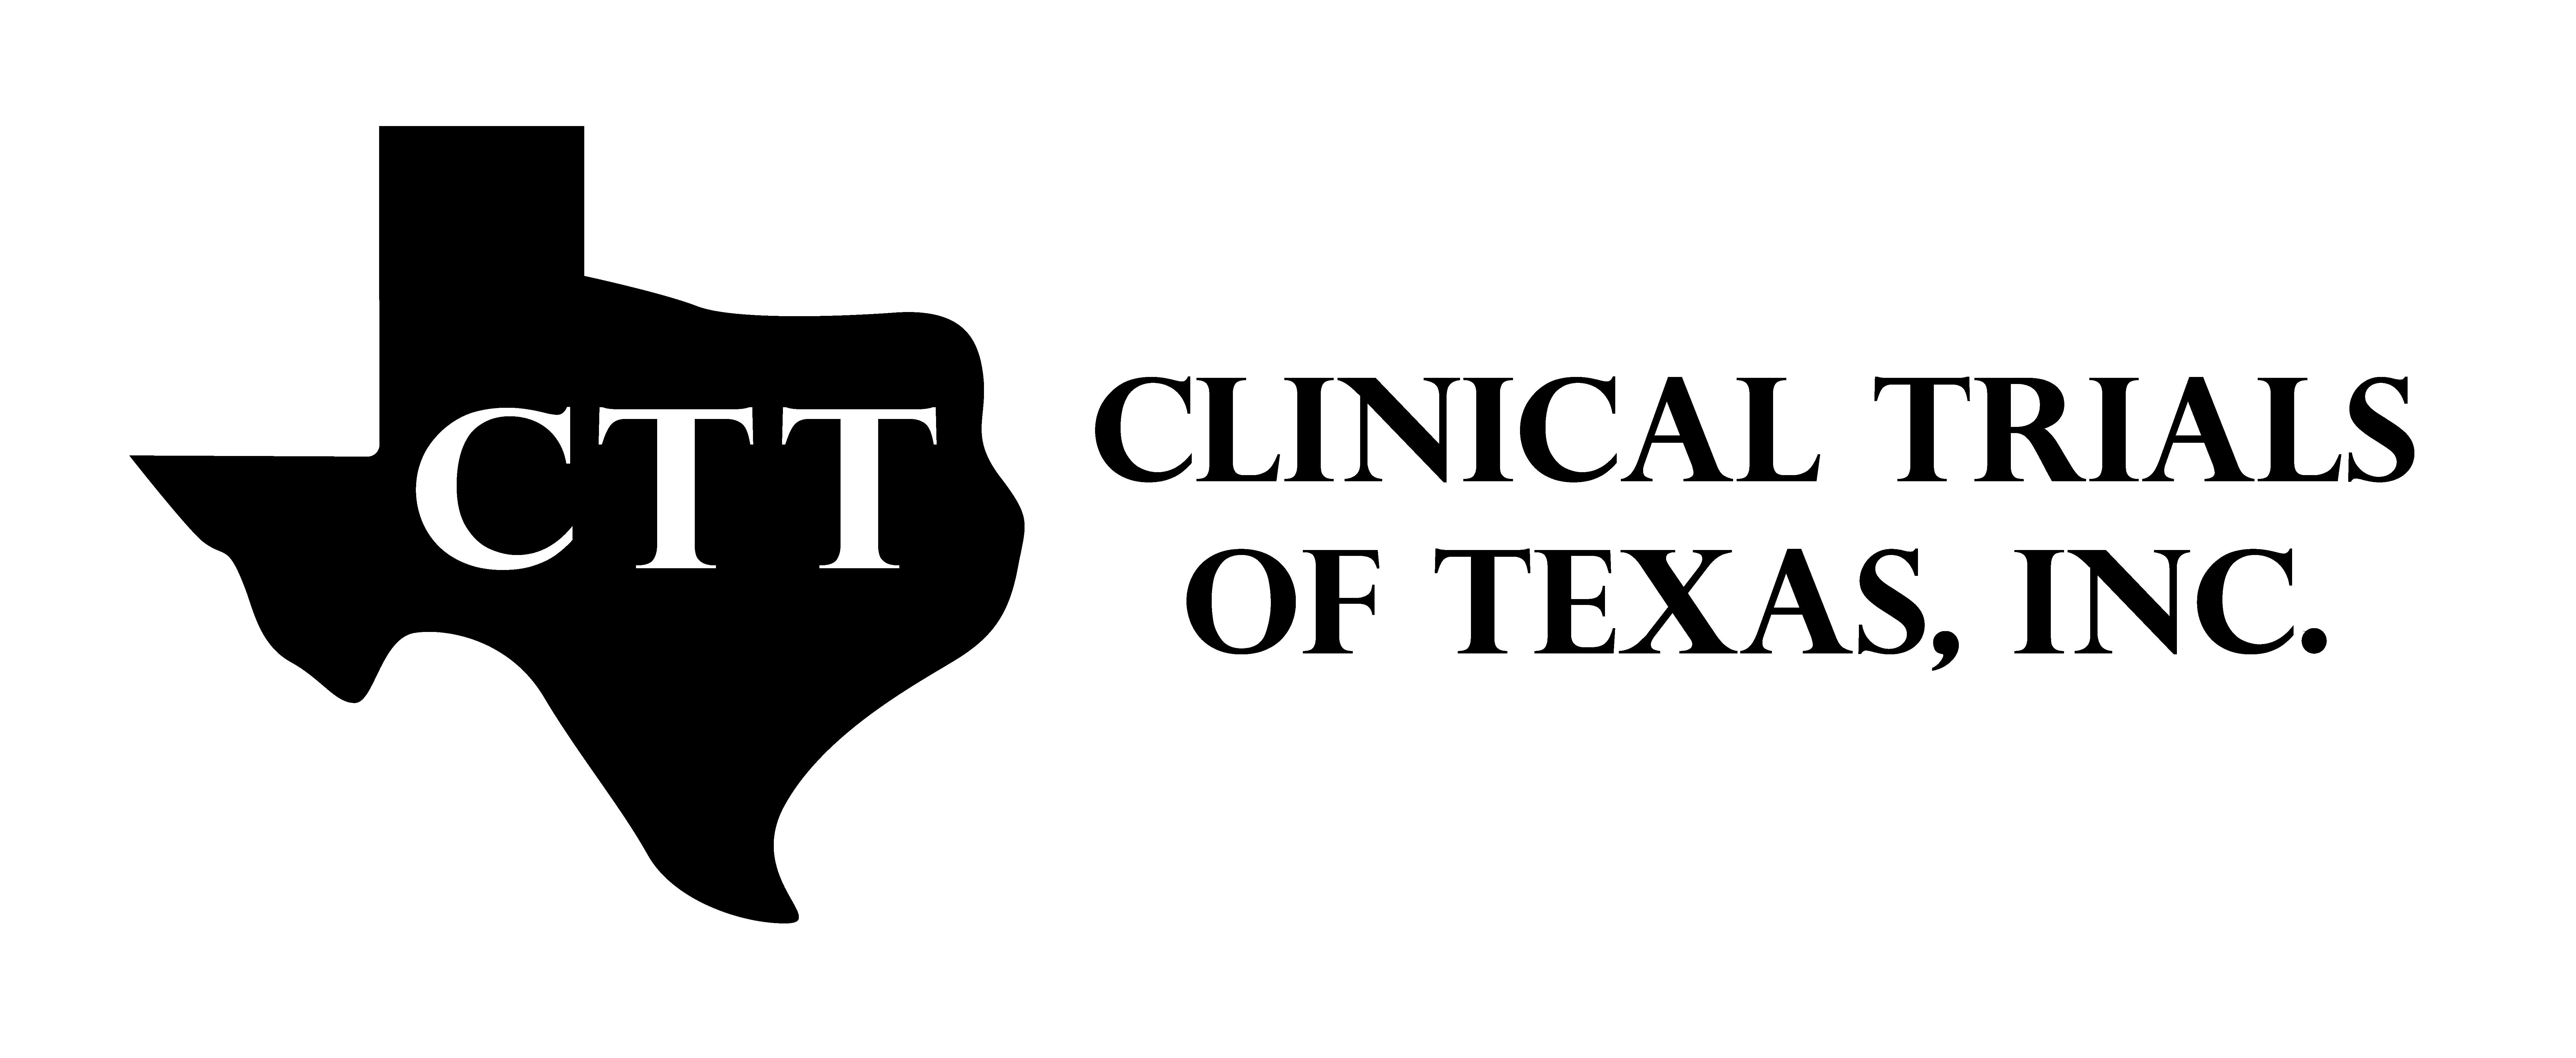 Clinical Trials of Texas, Inc. logo